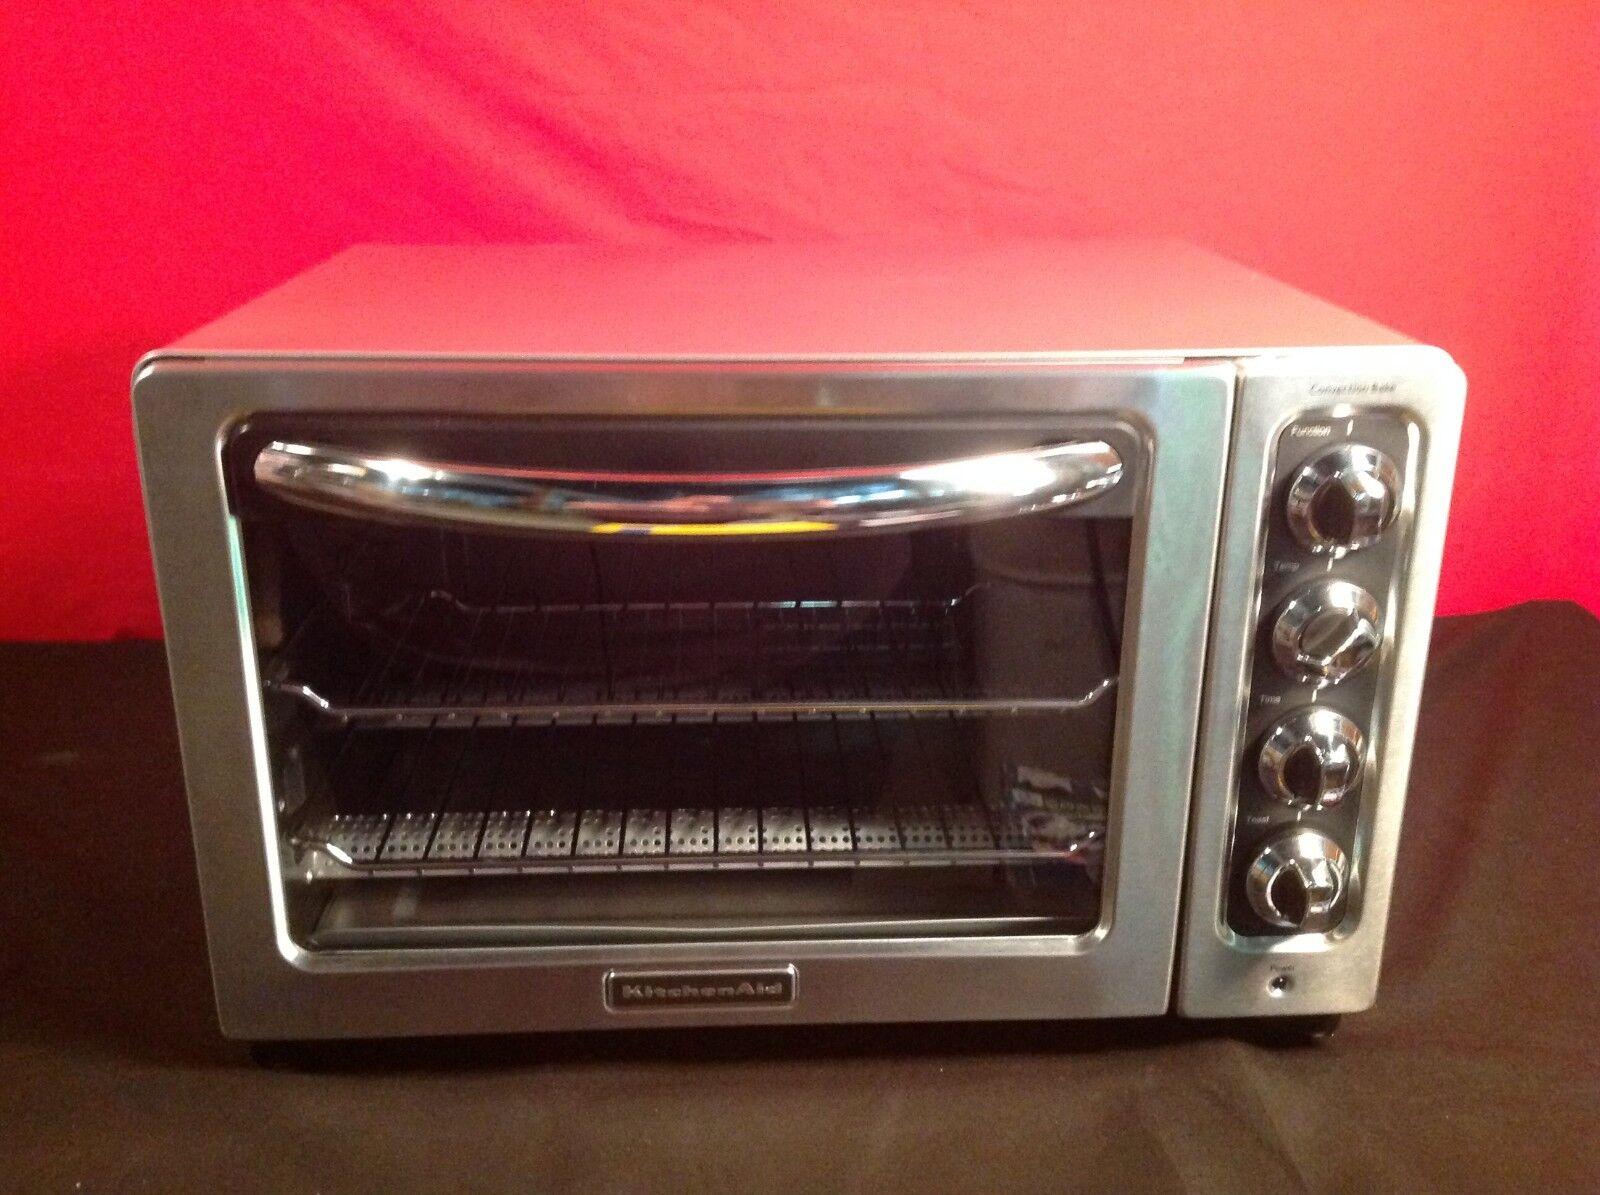 KitchenAid KCO223CU Toaster Oven - Broil, Toast, Bagel, Bake